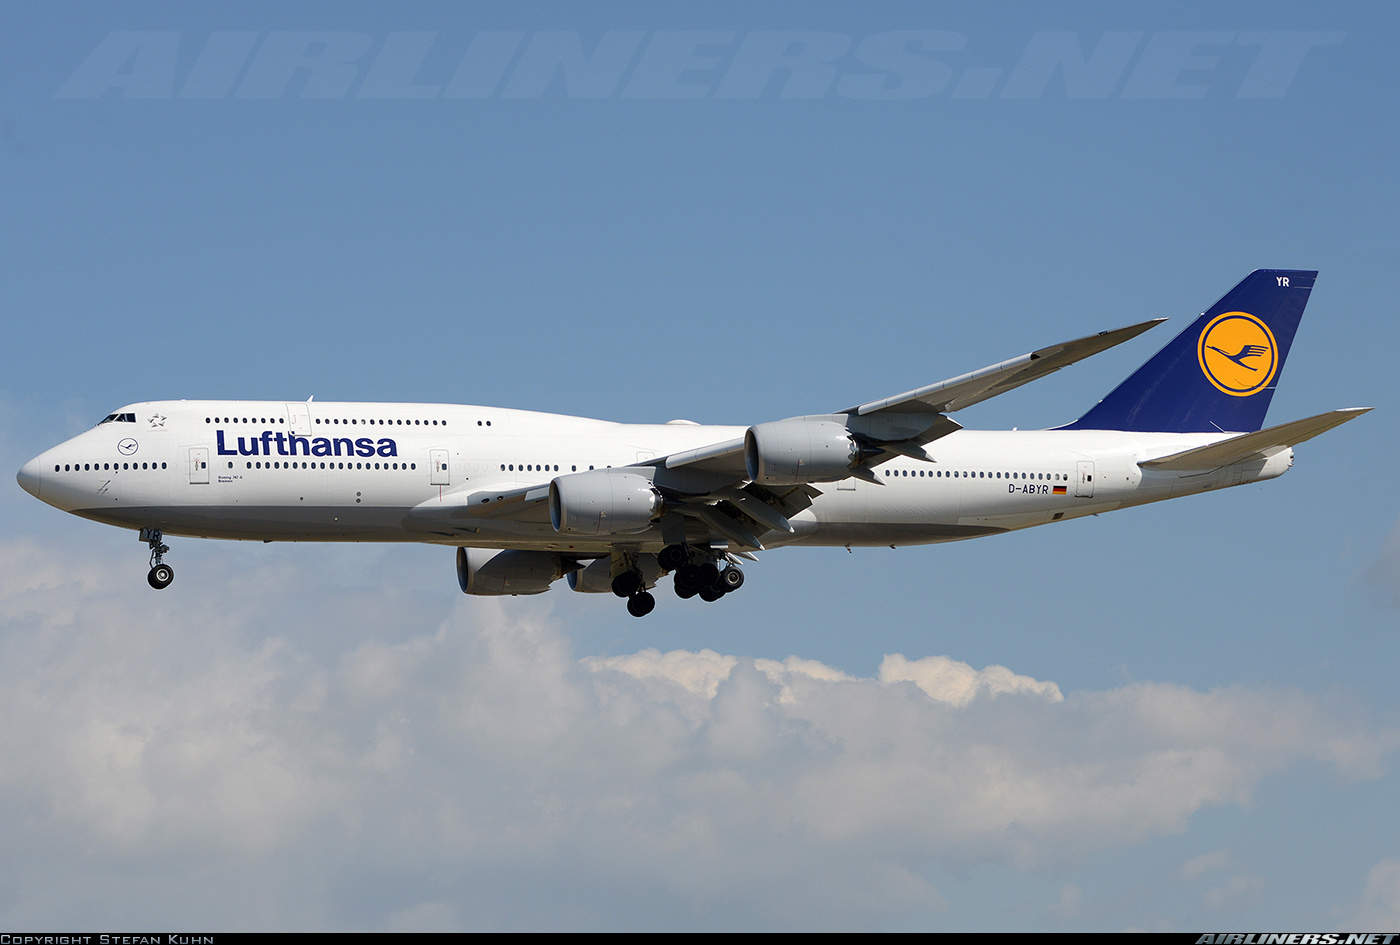 Lufthansa 430 diverts because of medical emergency